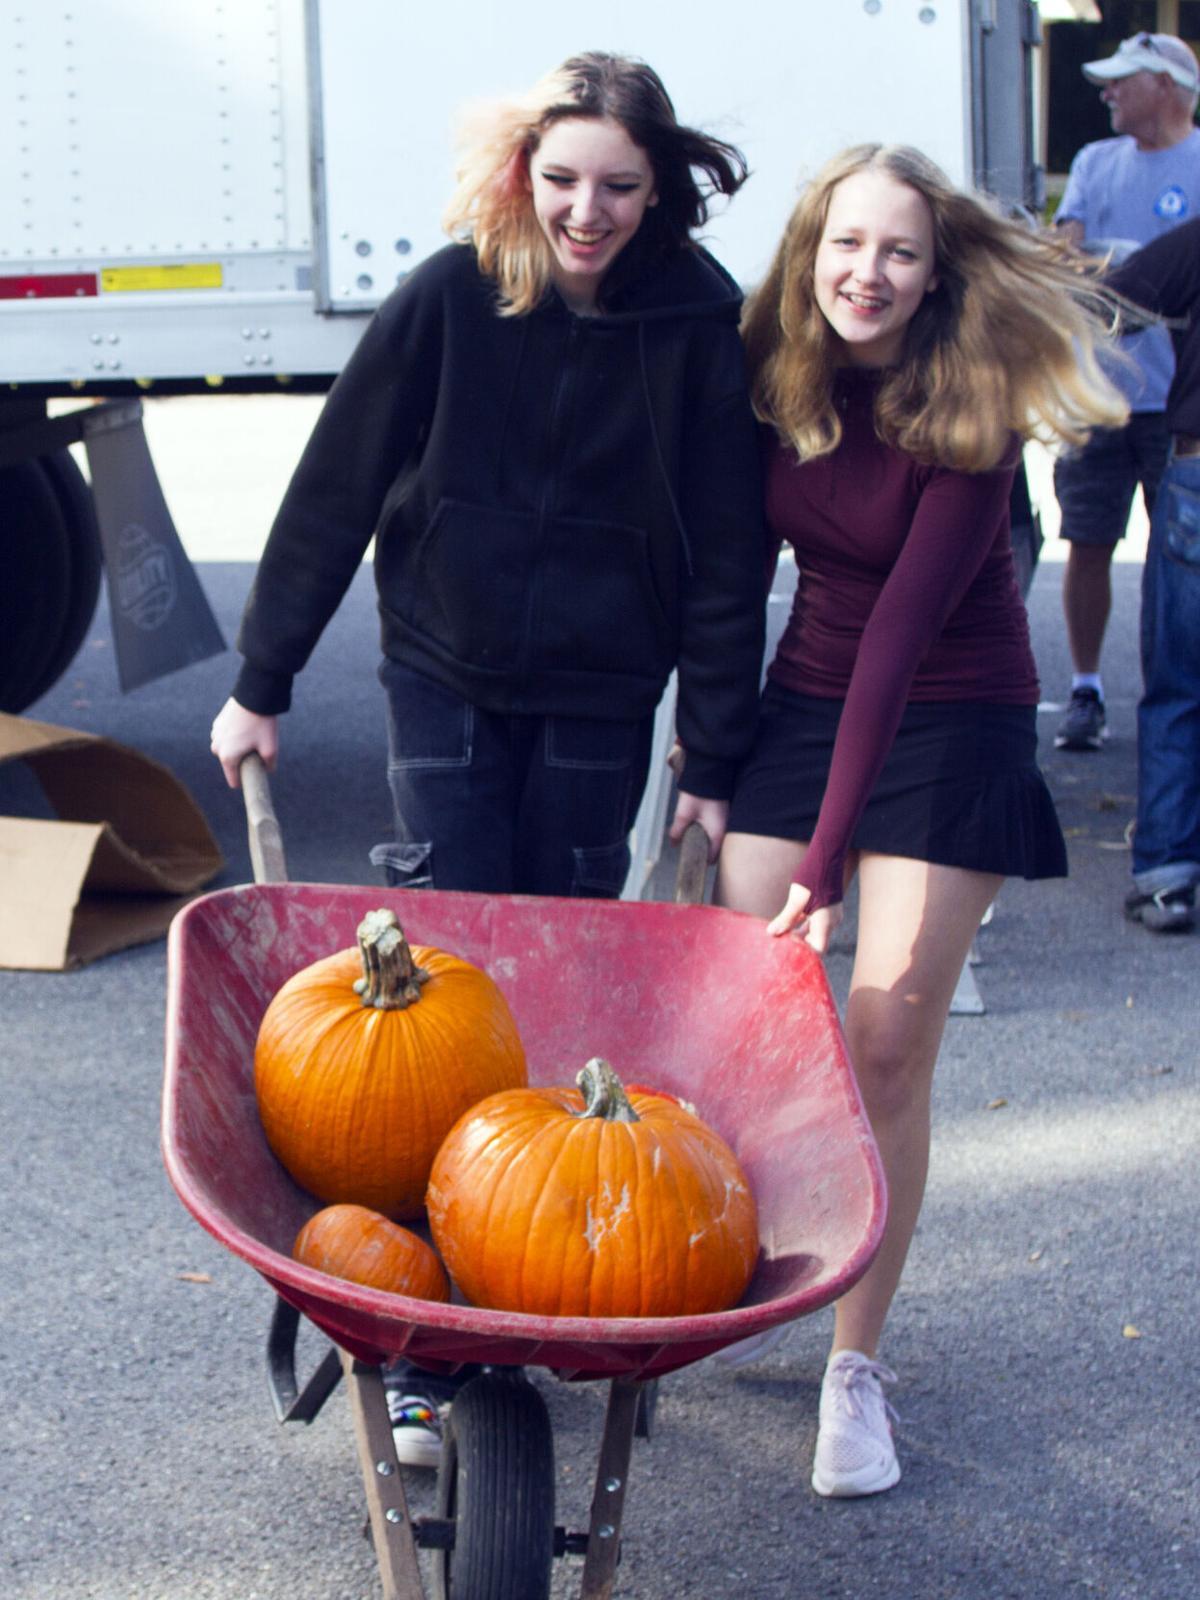 Vivian Page and Maddie Senneway